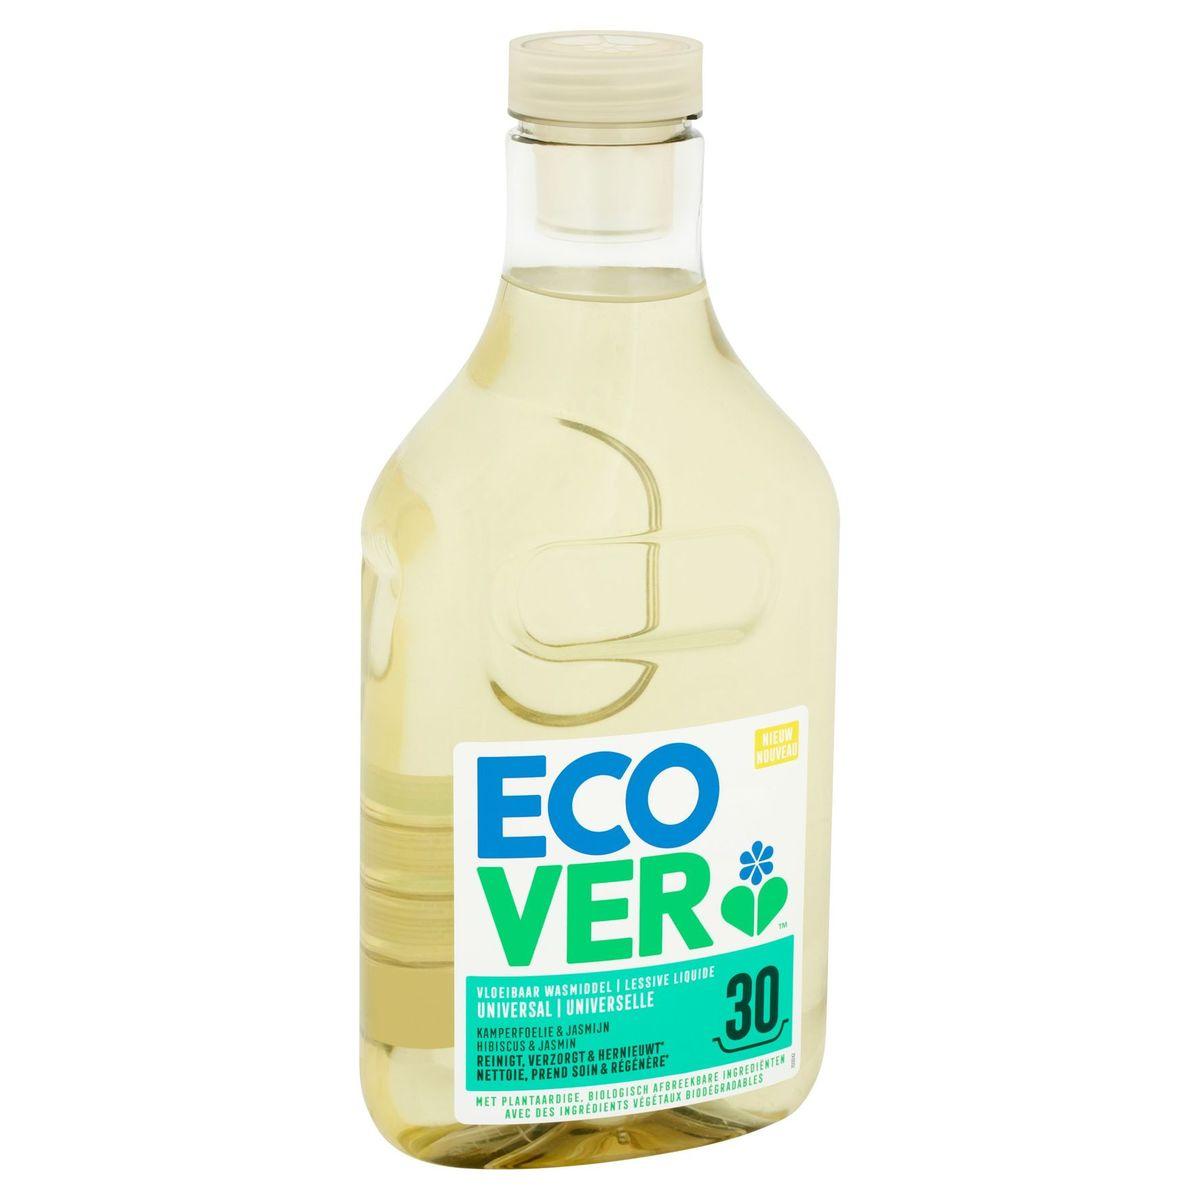 Ecover Lessive Liquide Universelle Hibiscus & Jasmin 30 Lavages 1.5 L